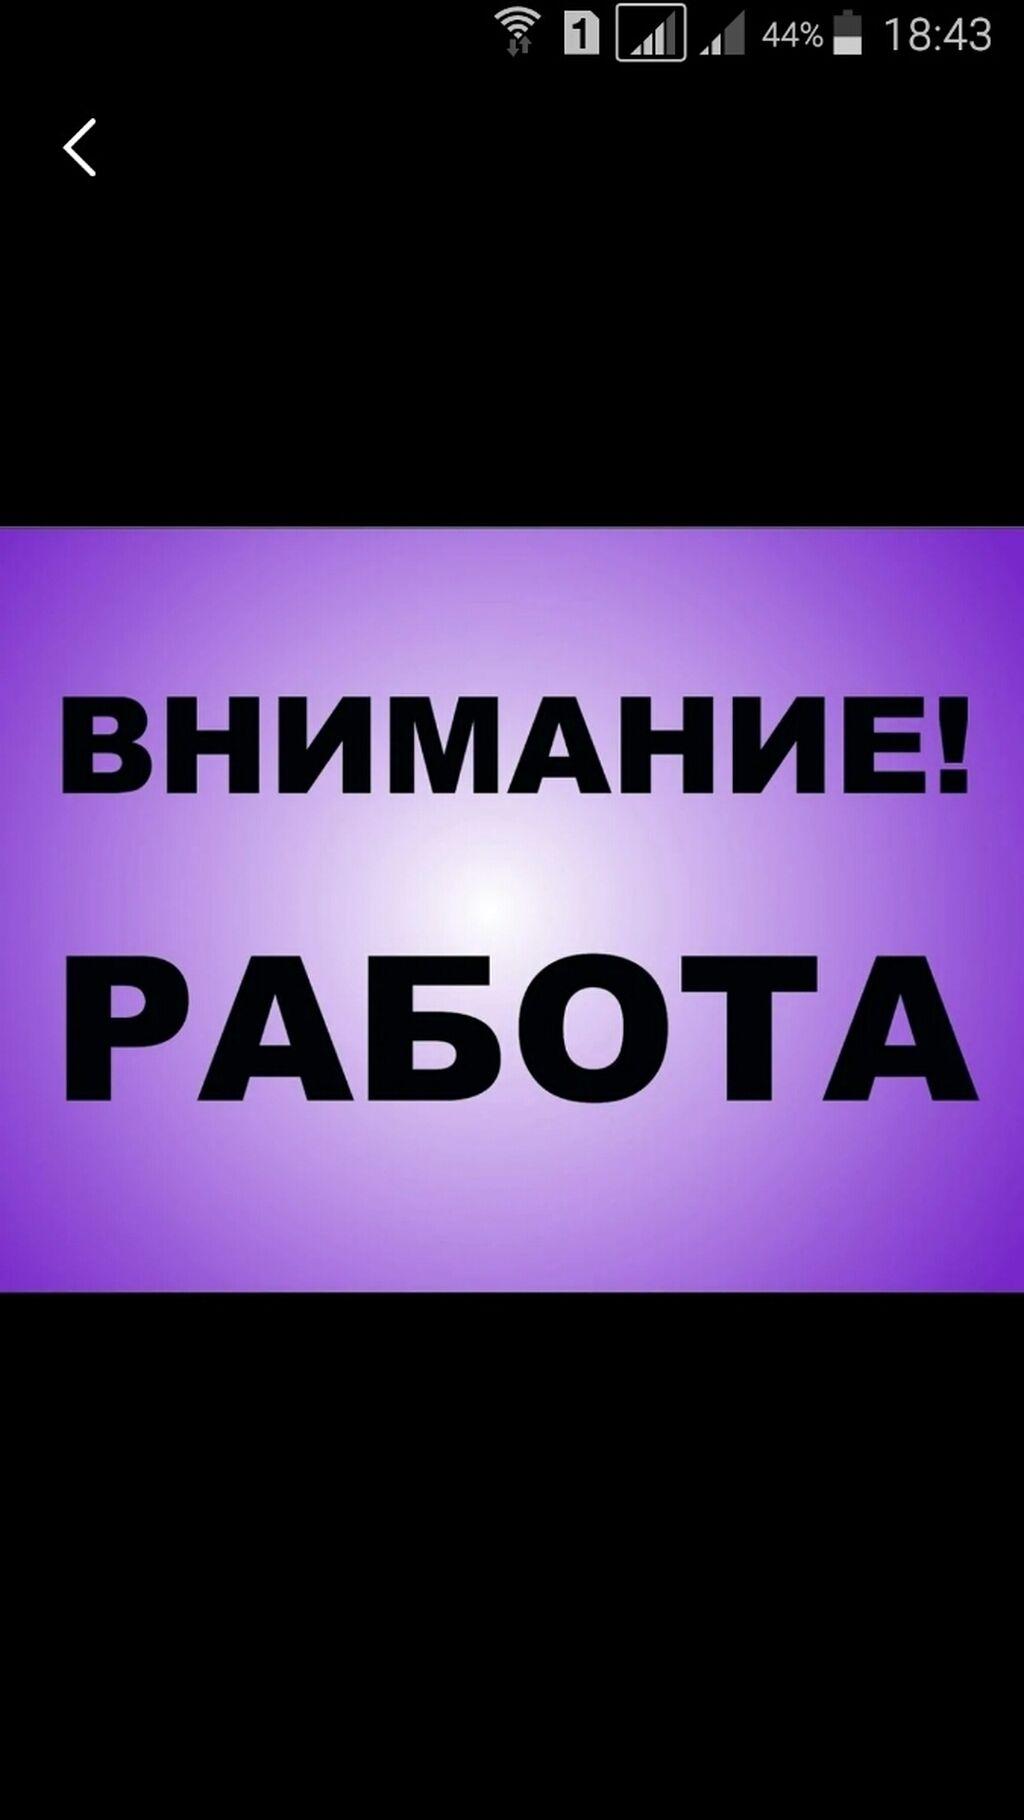 Работа с 8 до 17 вакансии для девушек визажист без опыта вакансии москва